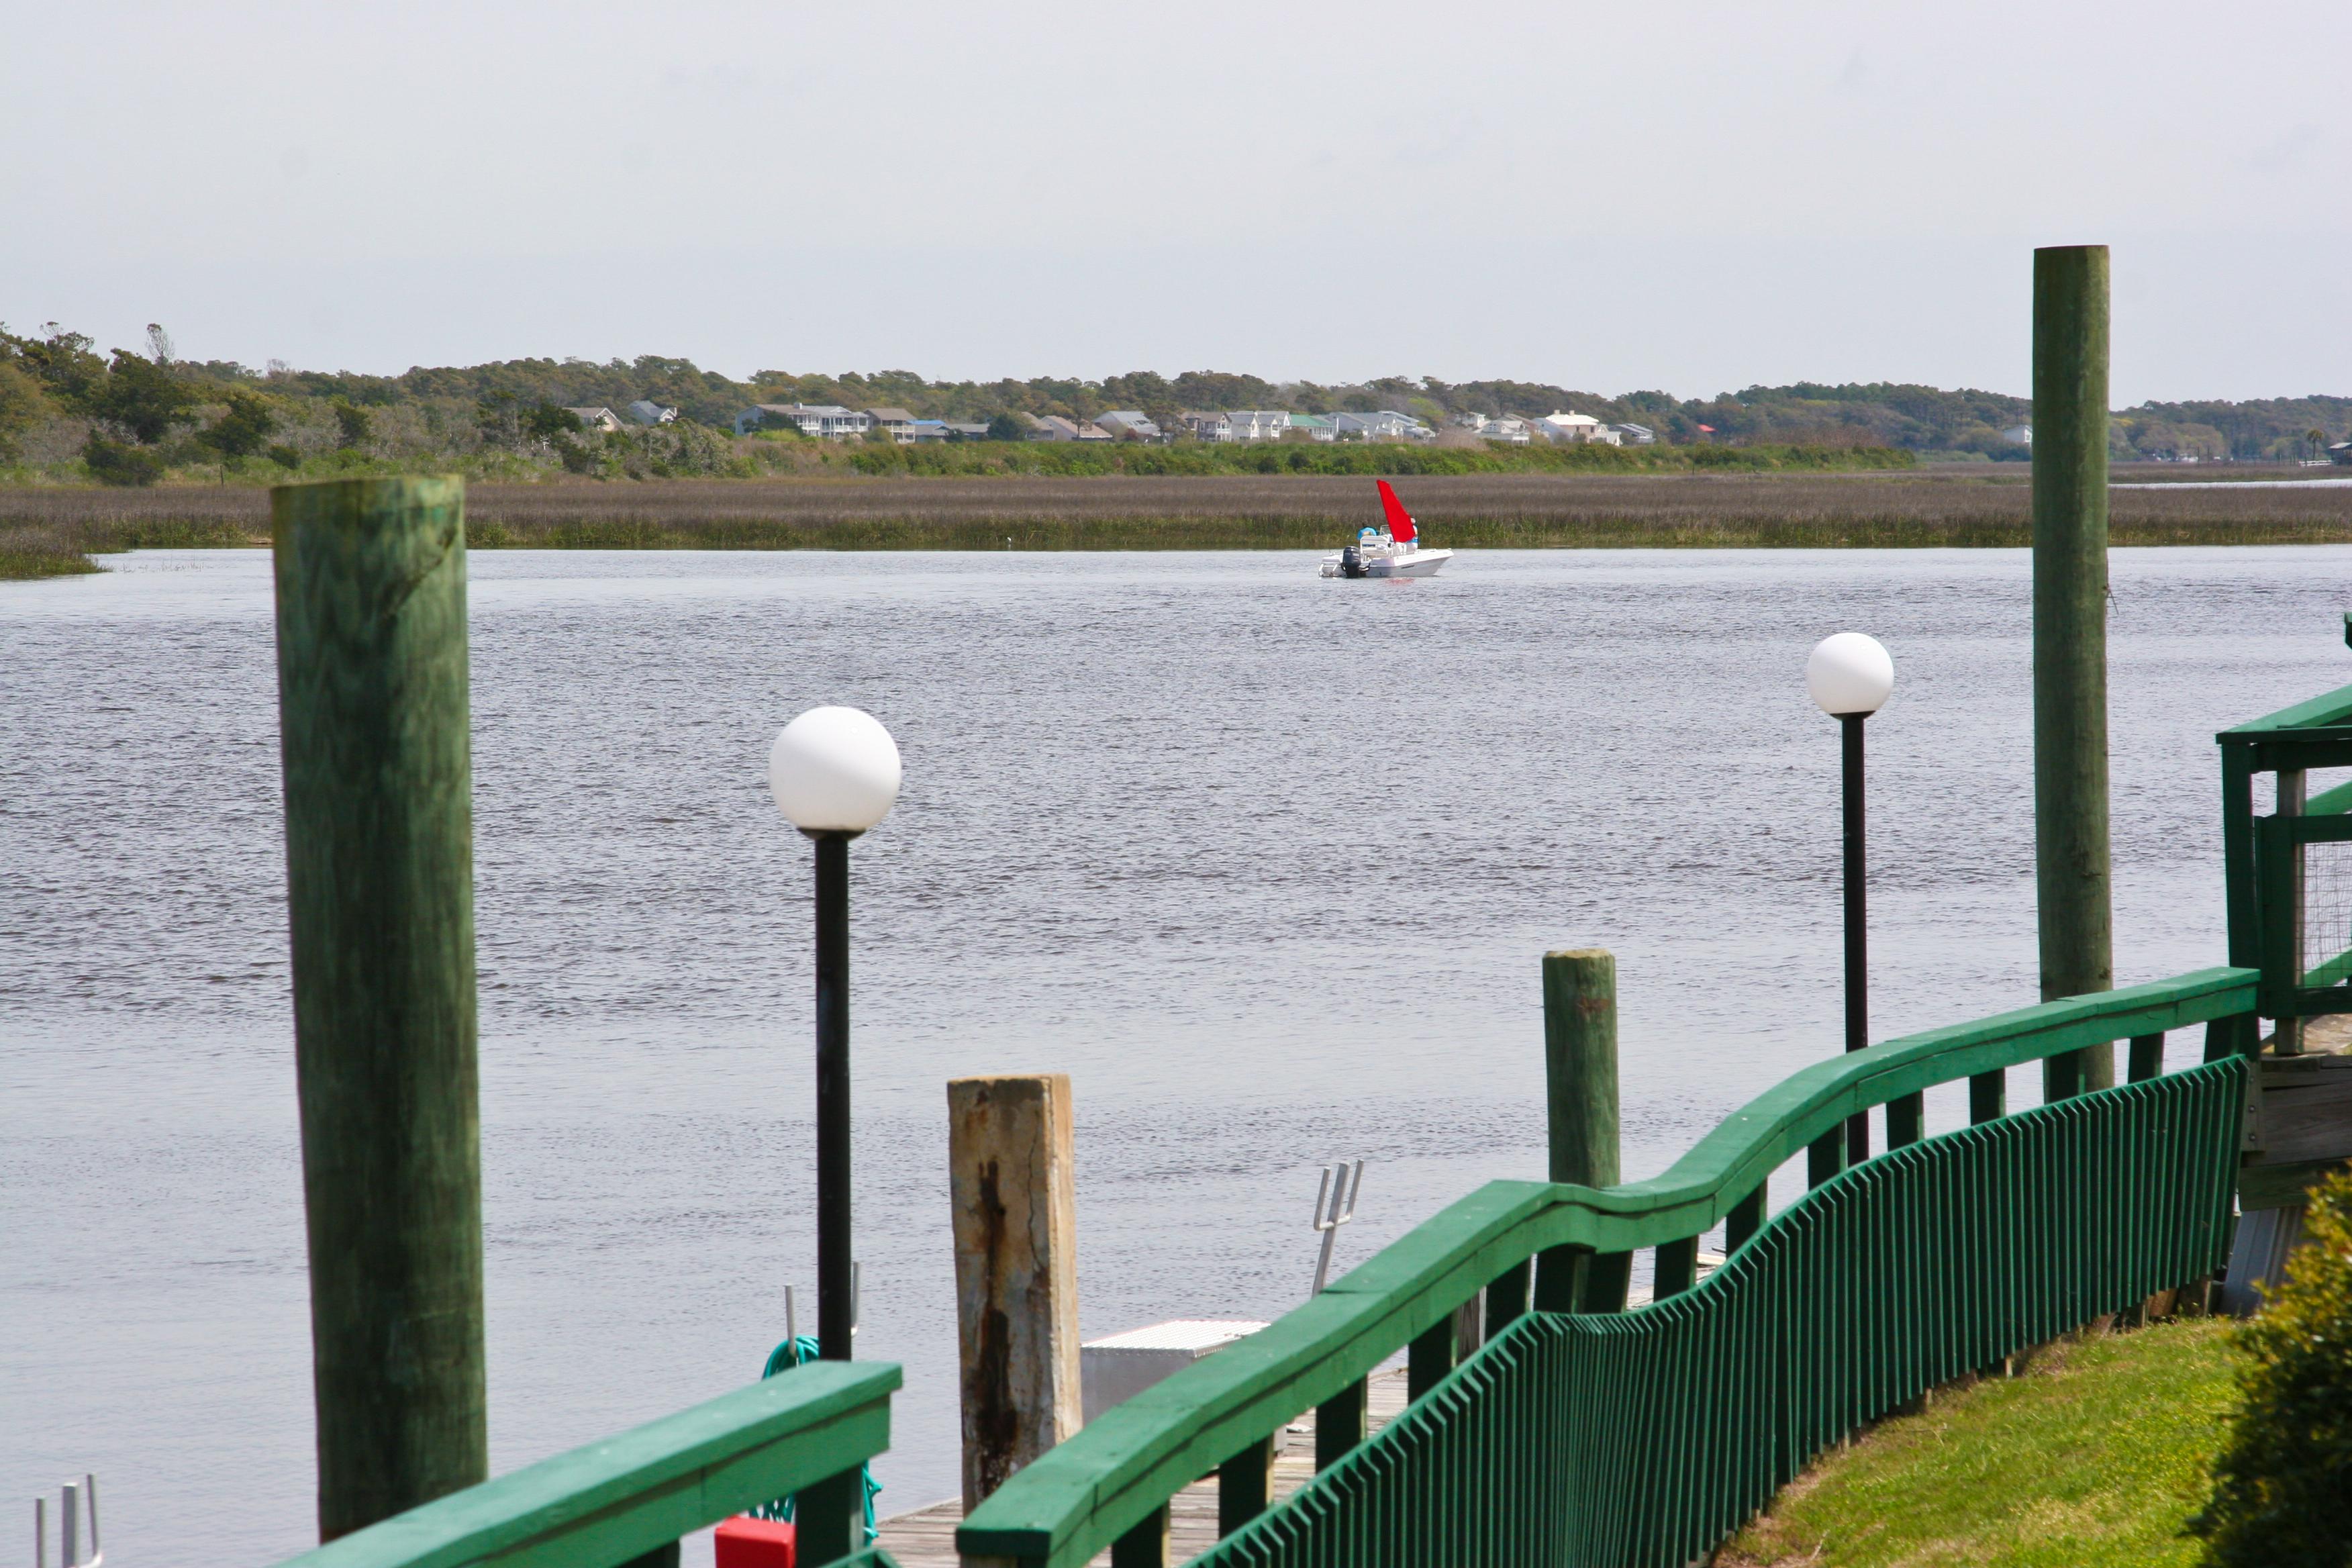 Lockwood Folly at Blue Water Point Marina